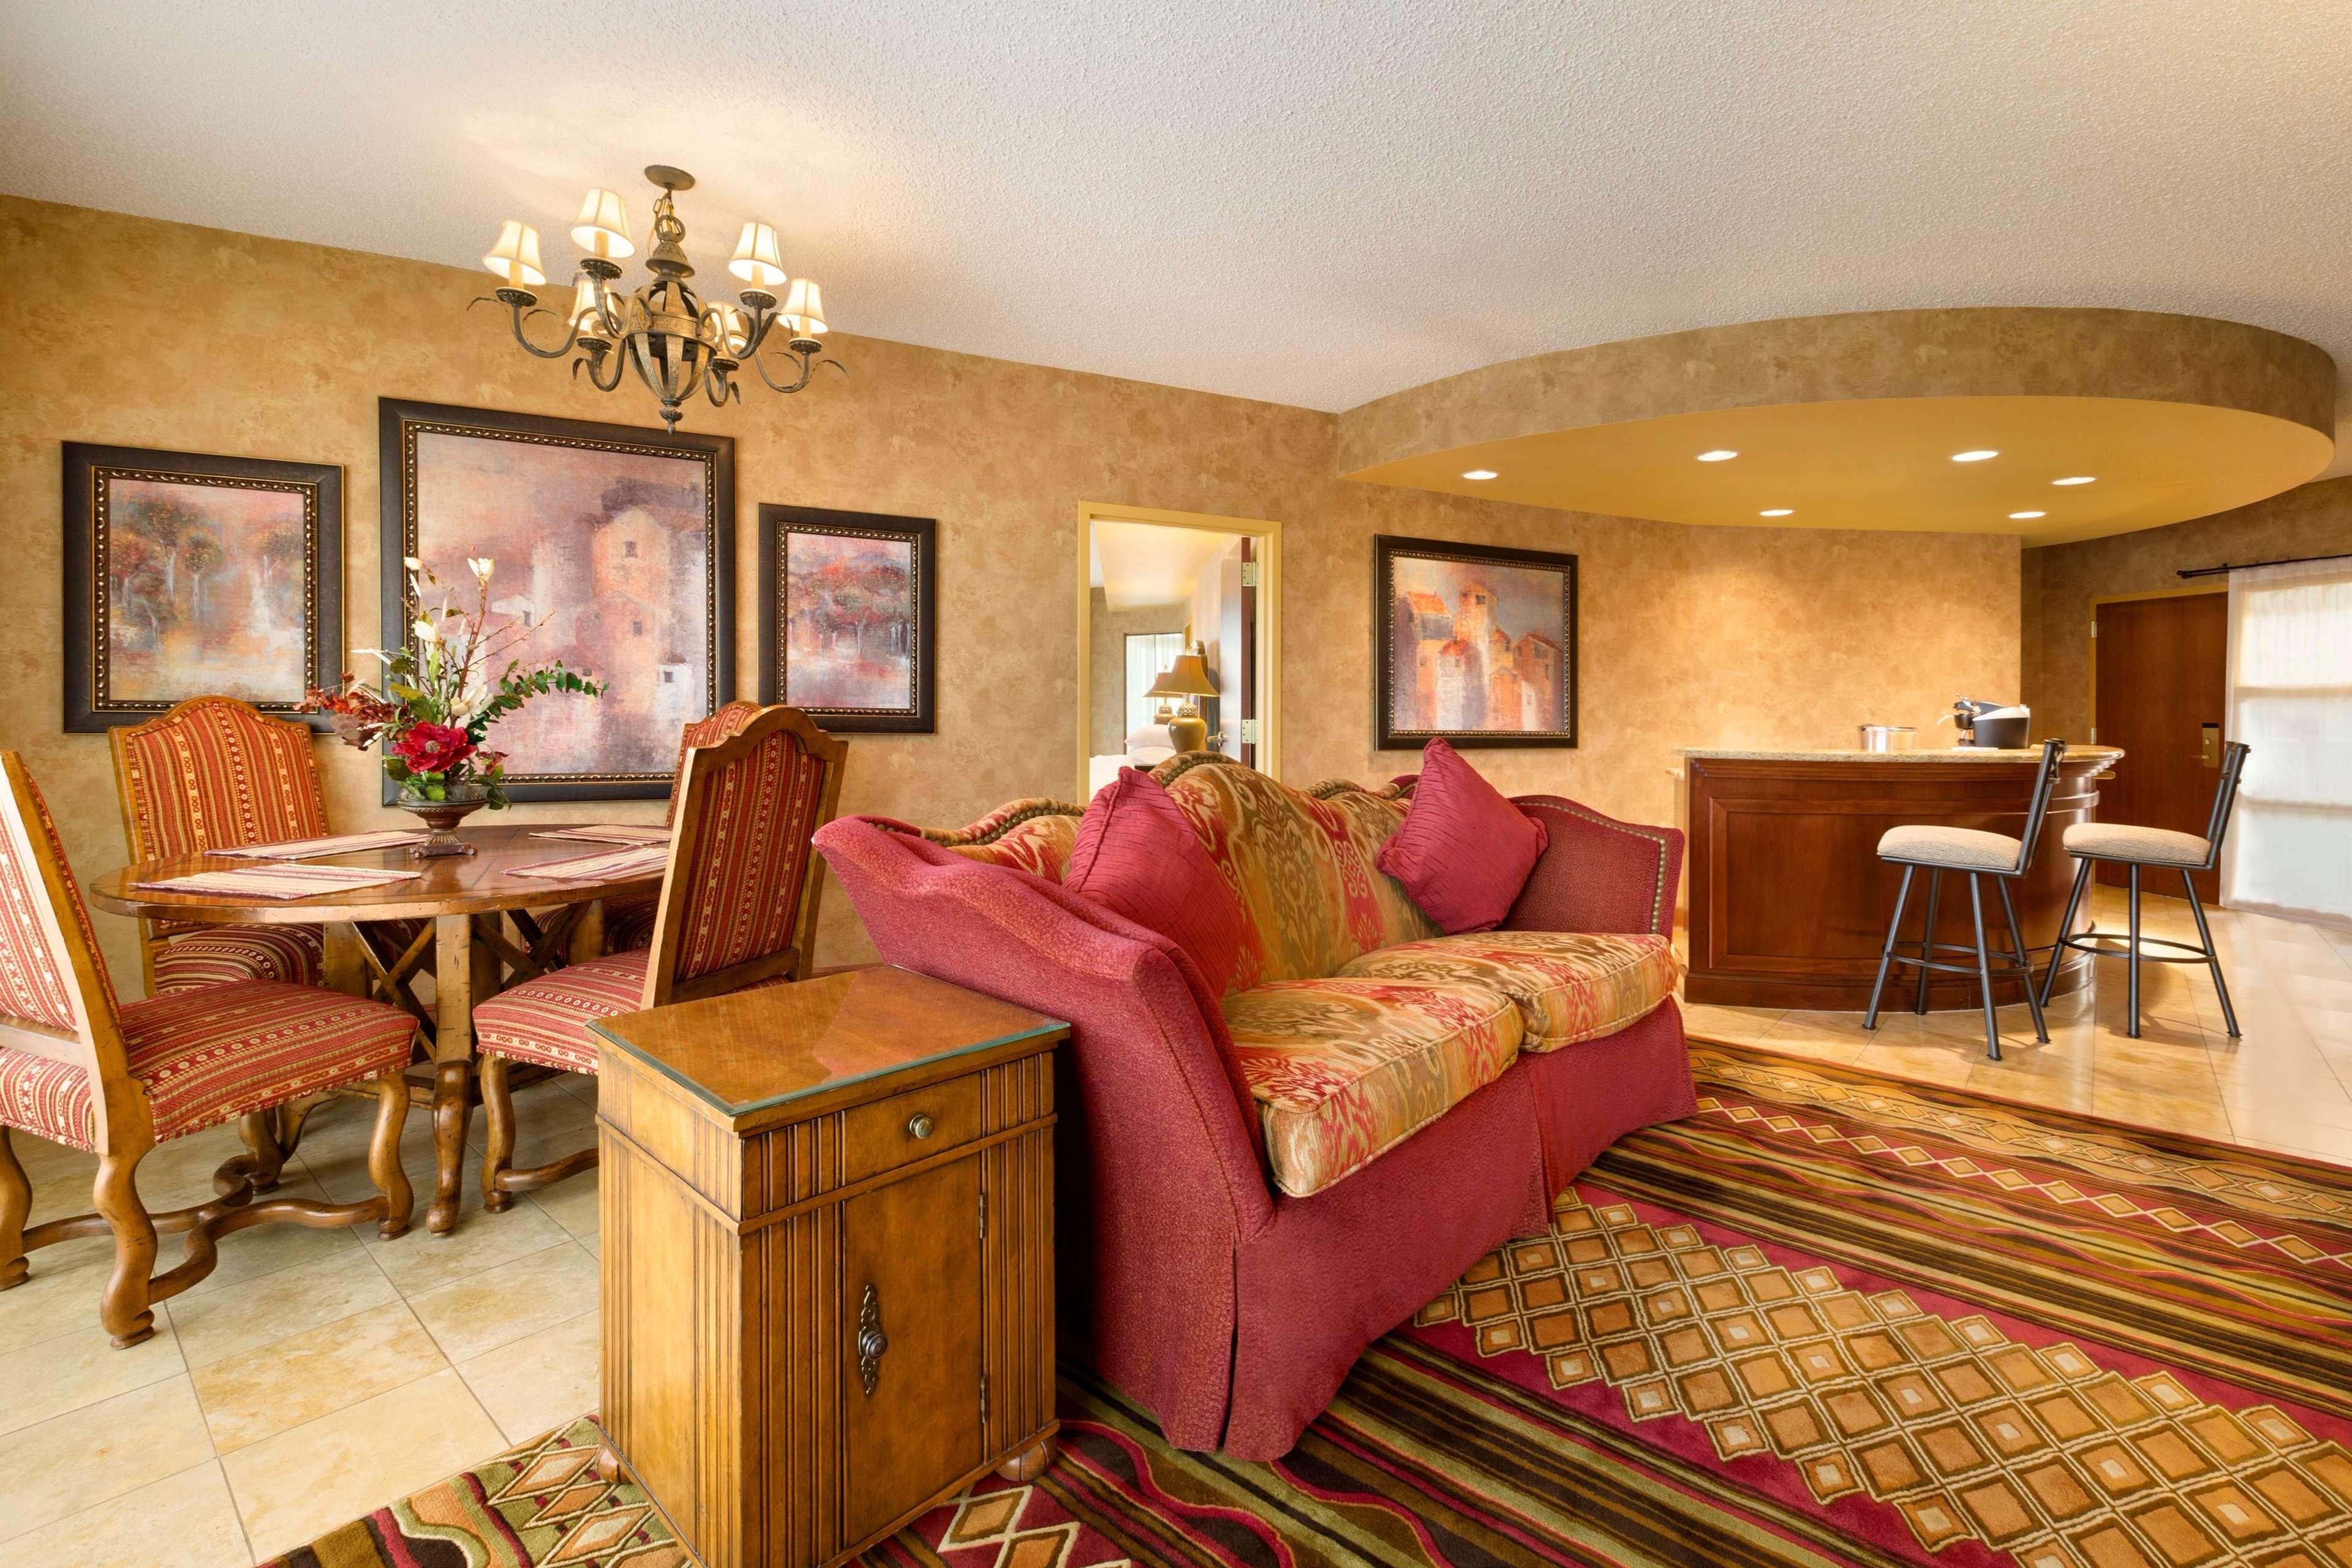 Embassy Suites by Hilton Albuquerque Hotel & Spa image 16